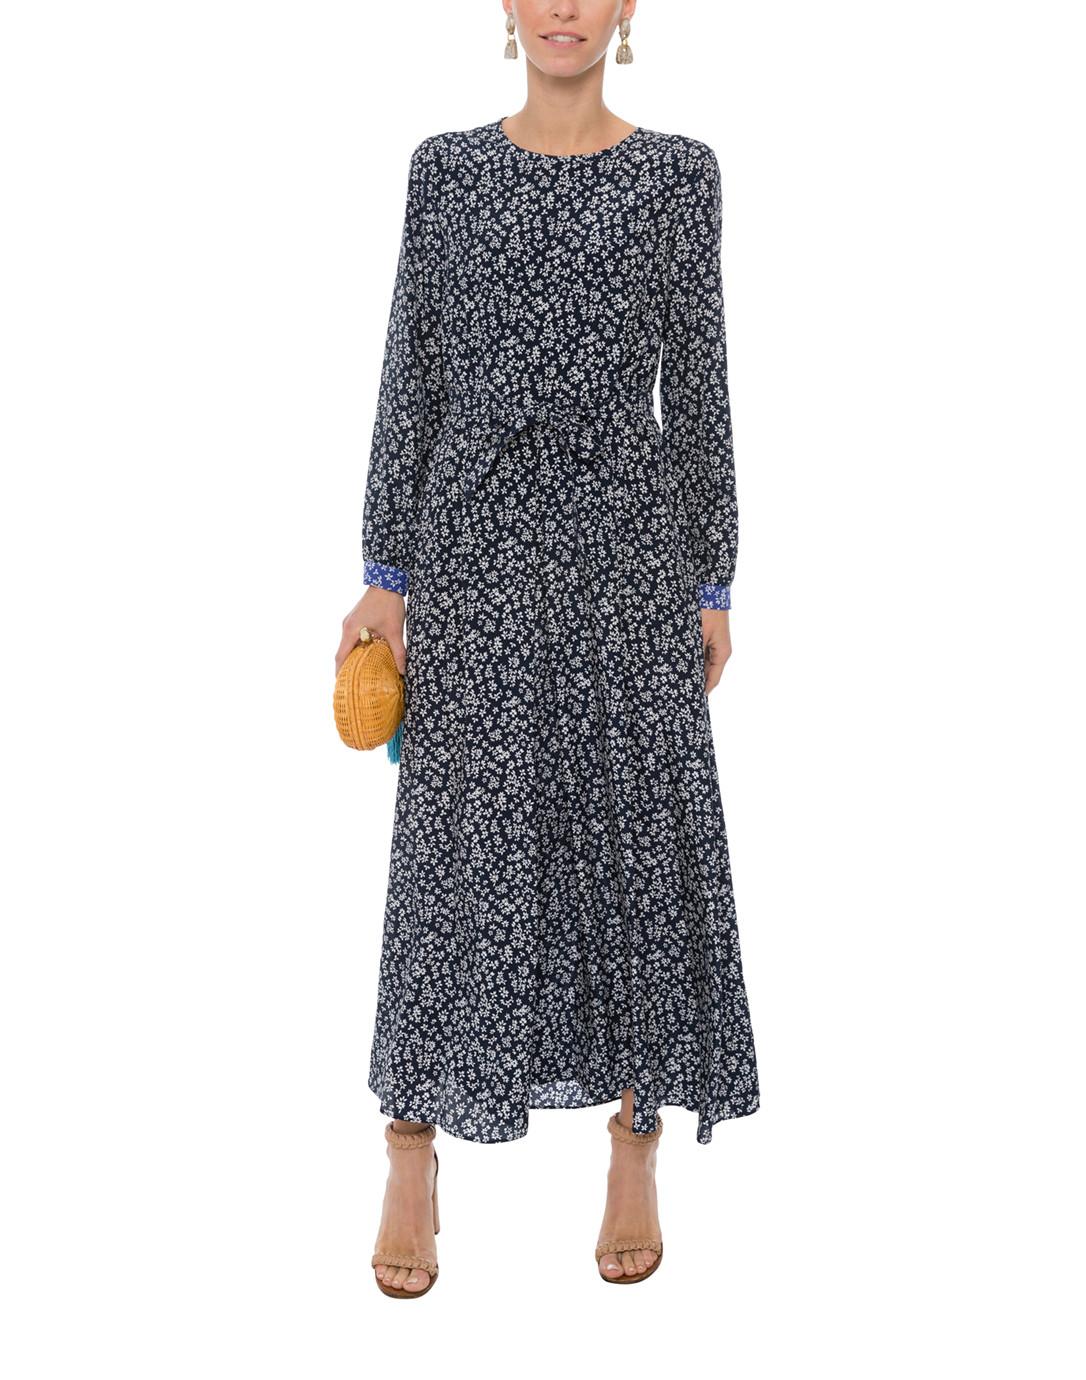 5645dc5e57d039 Tasso Navy Floral Printed Silk Maxi Dress